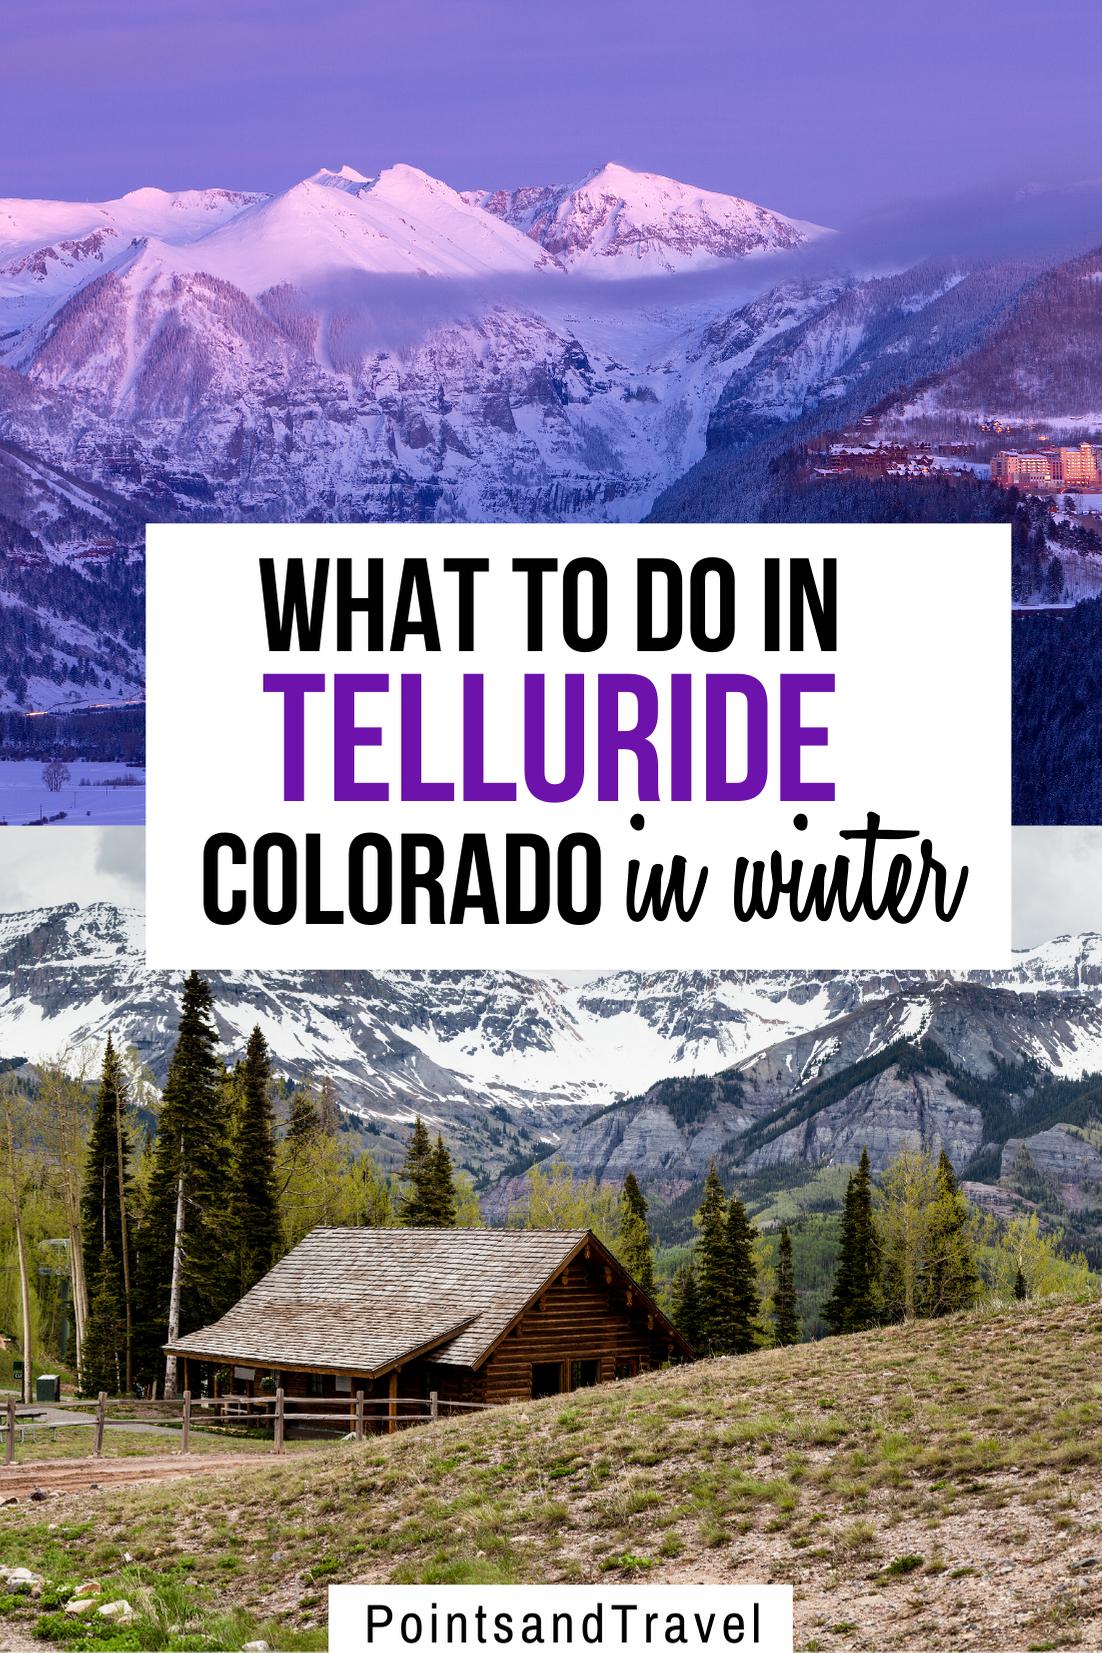 What to do in Telluride Colorado in Winter